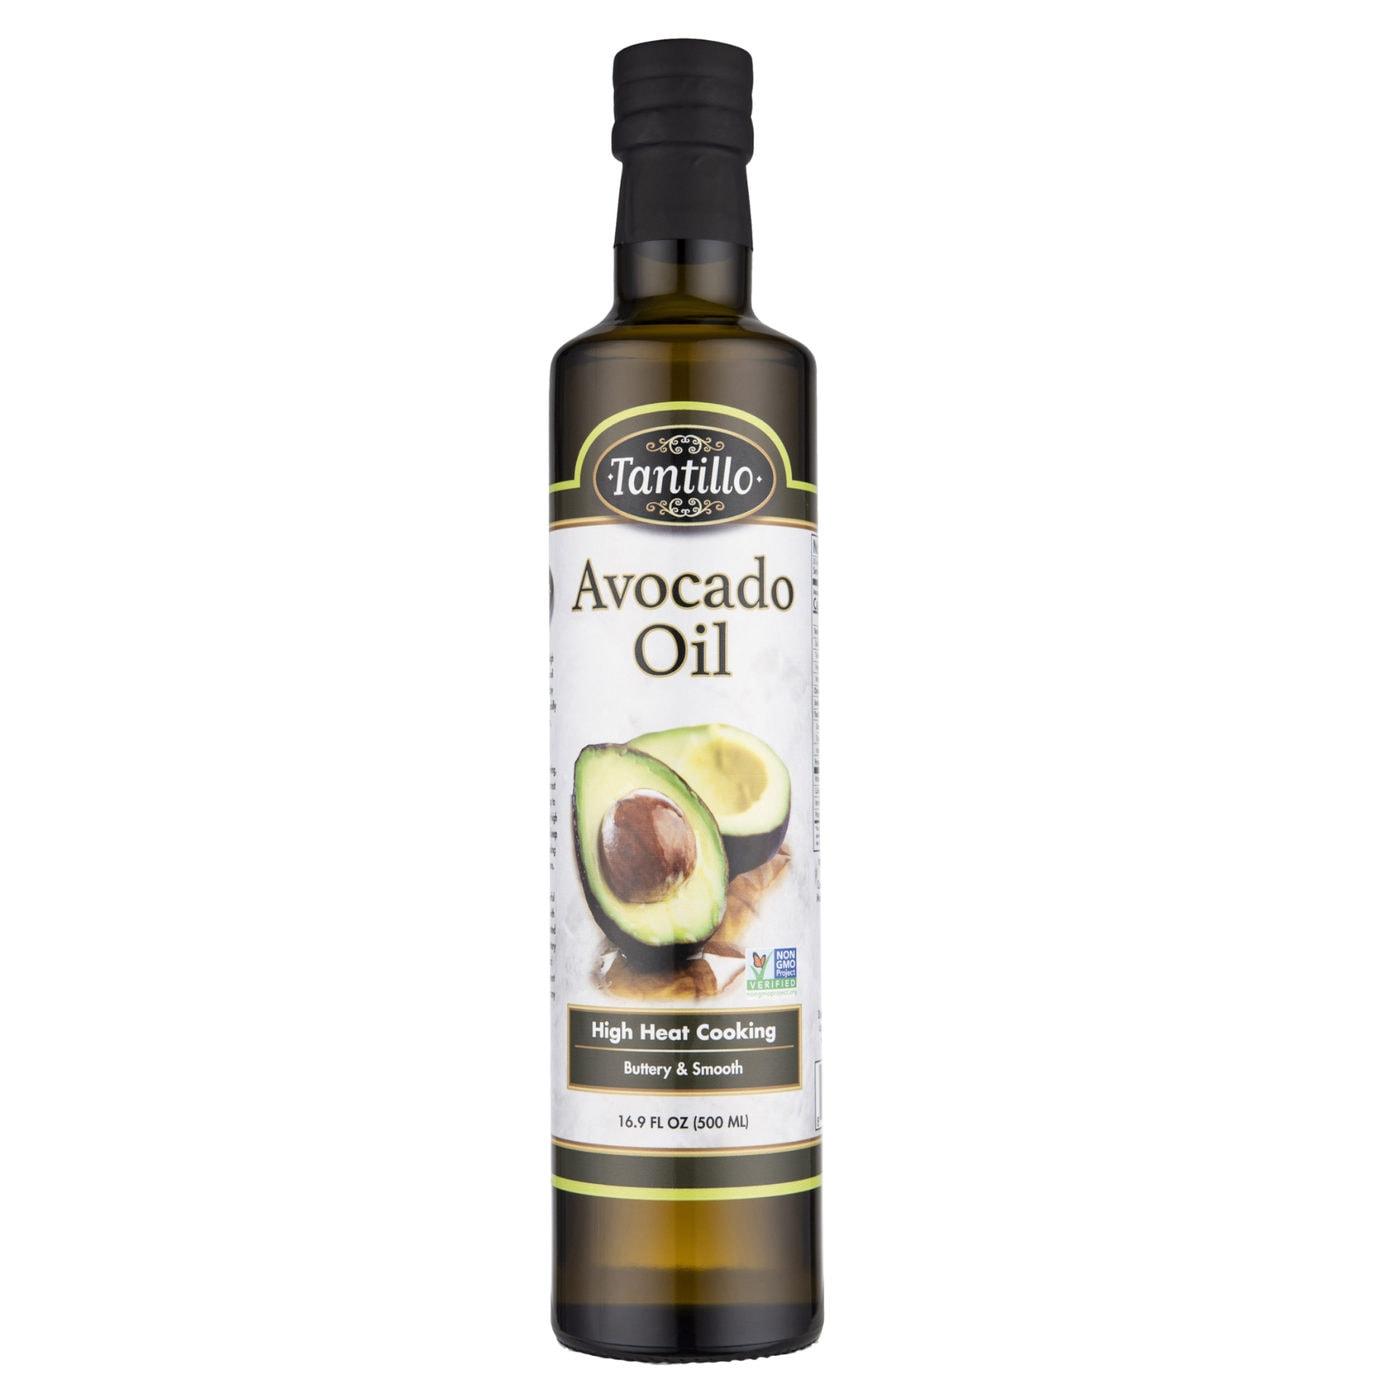 Tantillo Avocado Oil 500mL (Pack of 2)